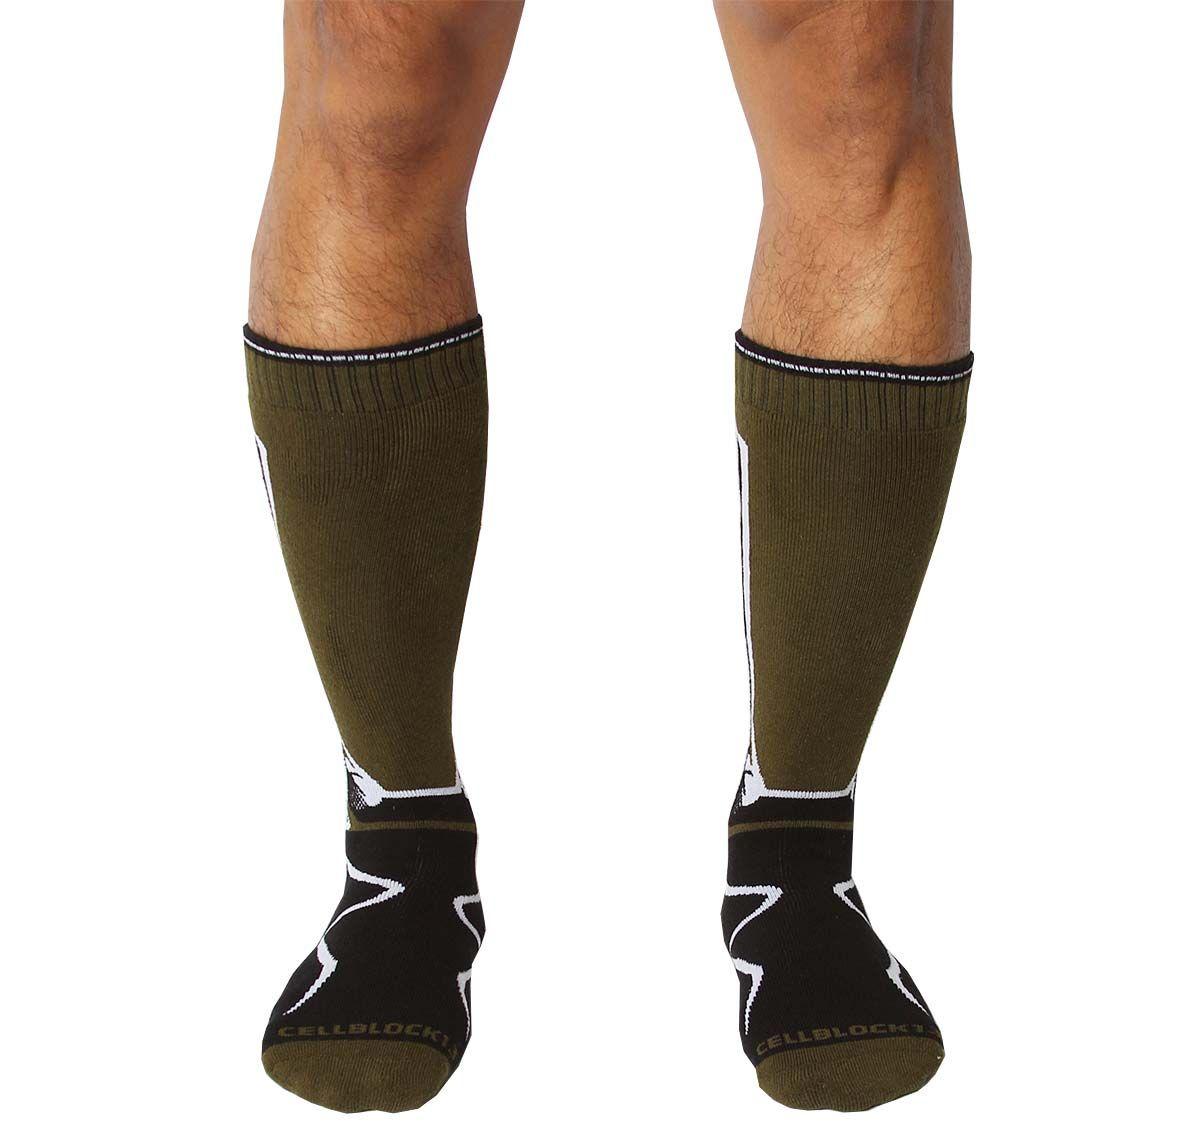 Cellblock 13 Calze sportive KENNEL CLUB Mid-Calf SOCK, verde army